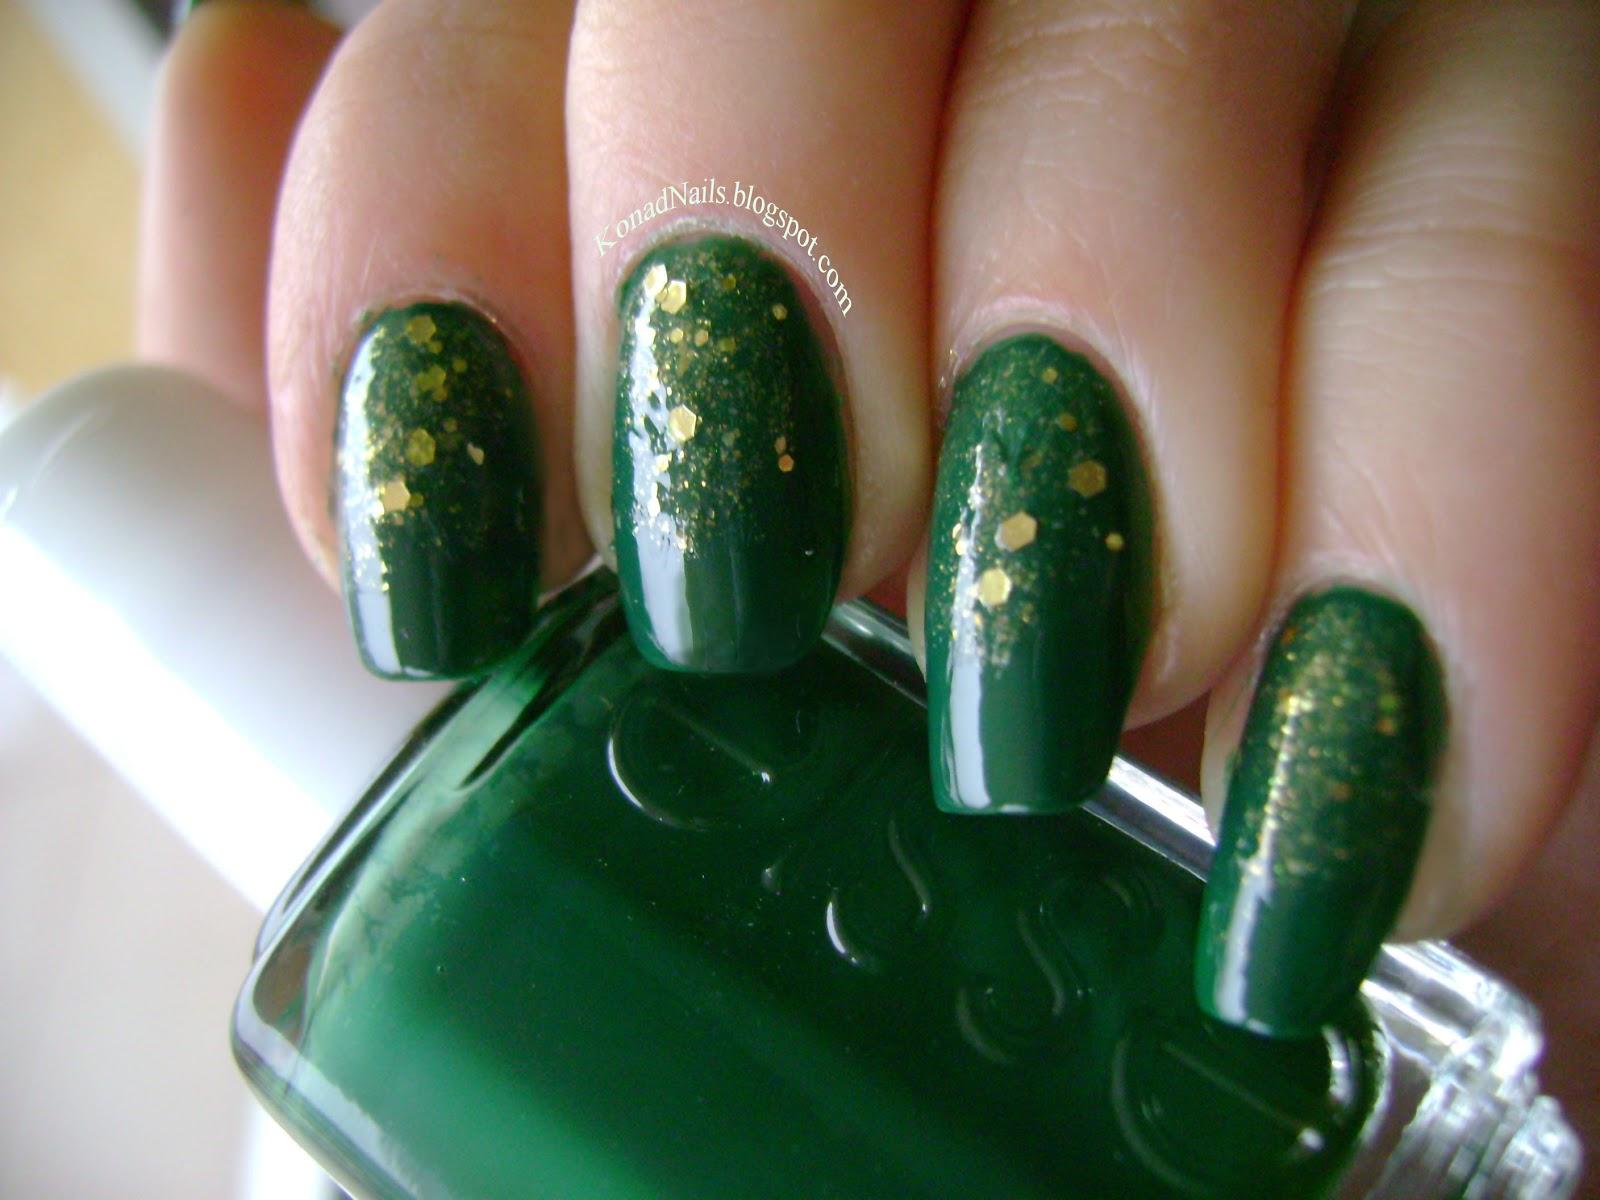 acrylic nail art designs: Glitter gradient manicure